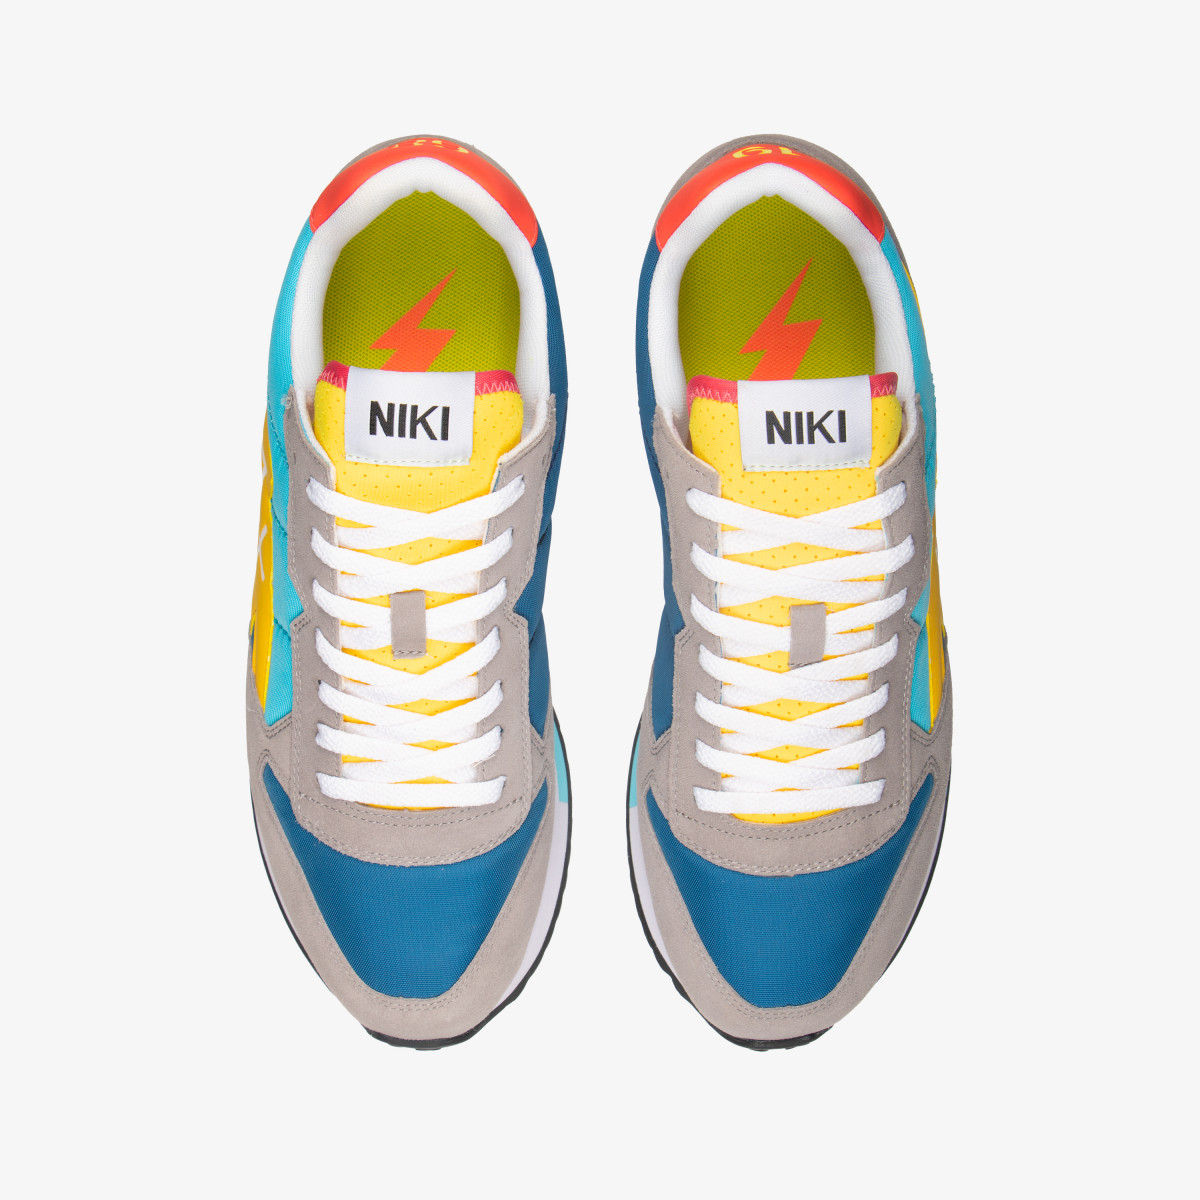 NIKI CRAZY BOY LIGHT BLUE/OTTANIO